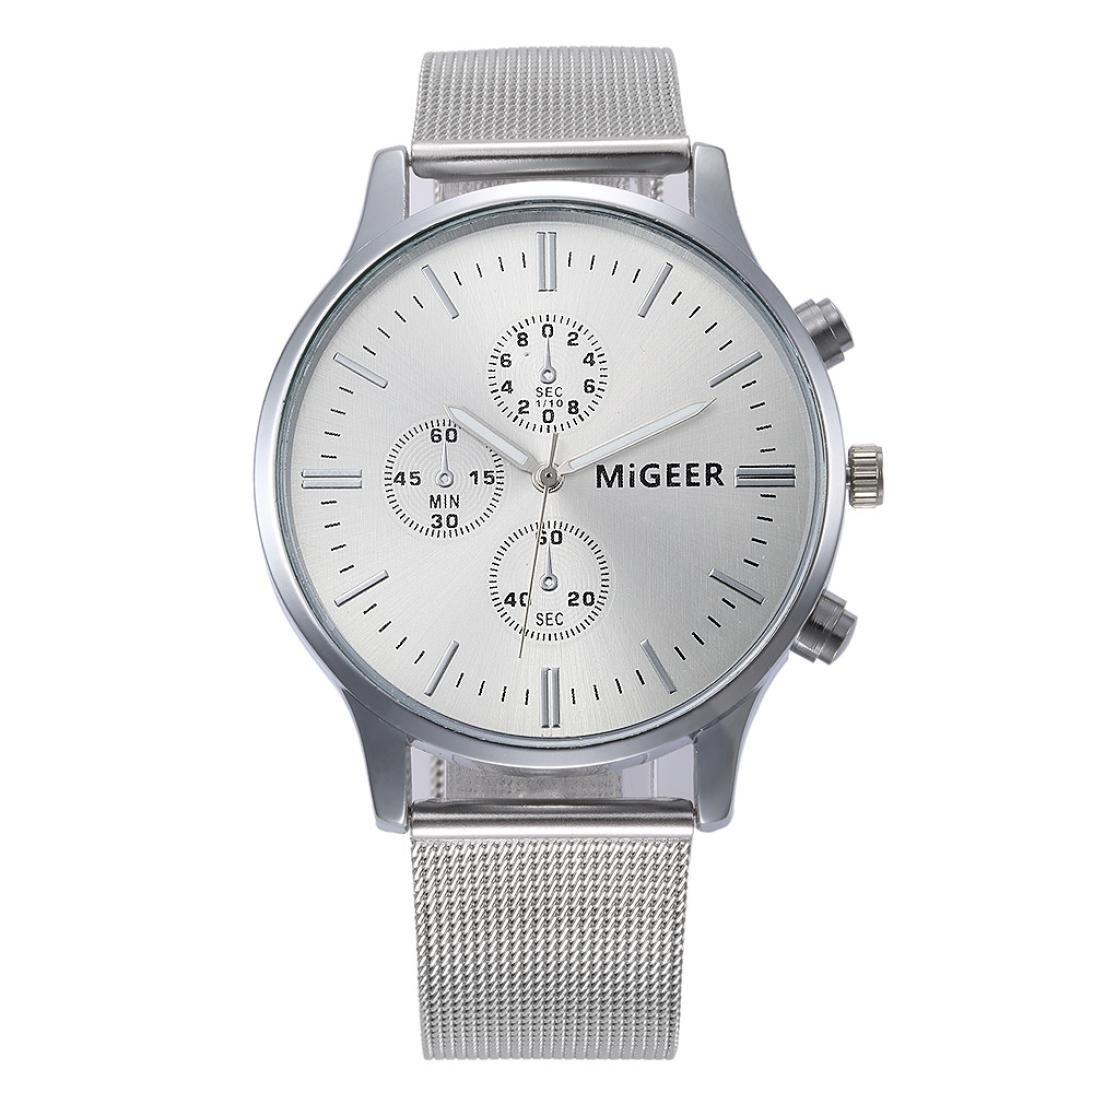 Mandystore Women's Men's Classic Wrist Watch Steel Strap Quartz Watches (Silver)